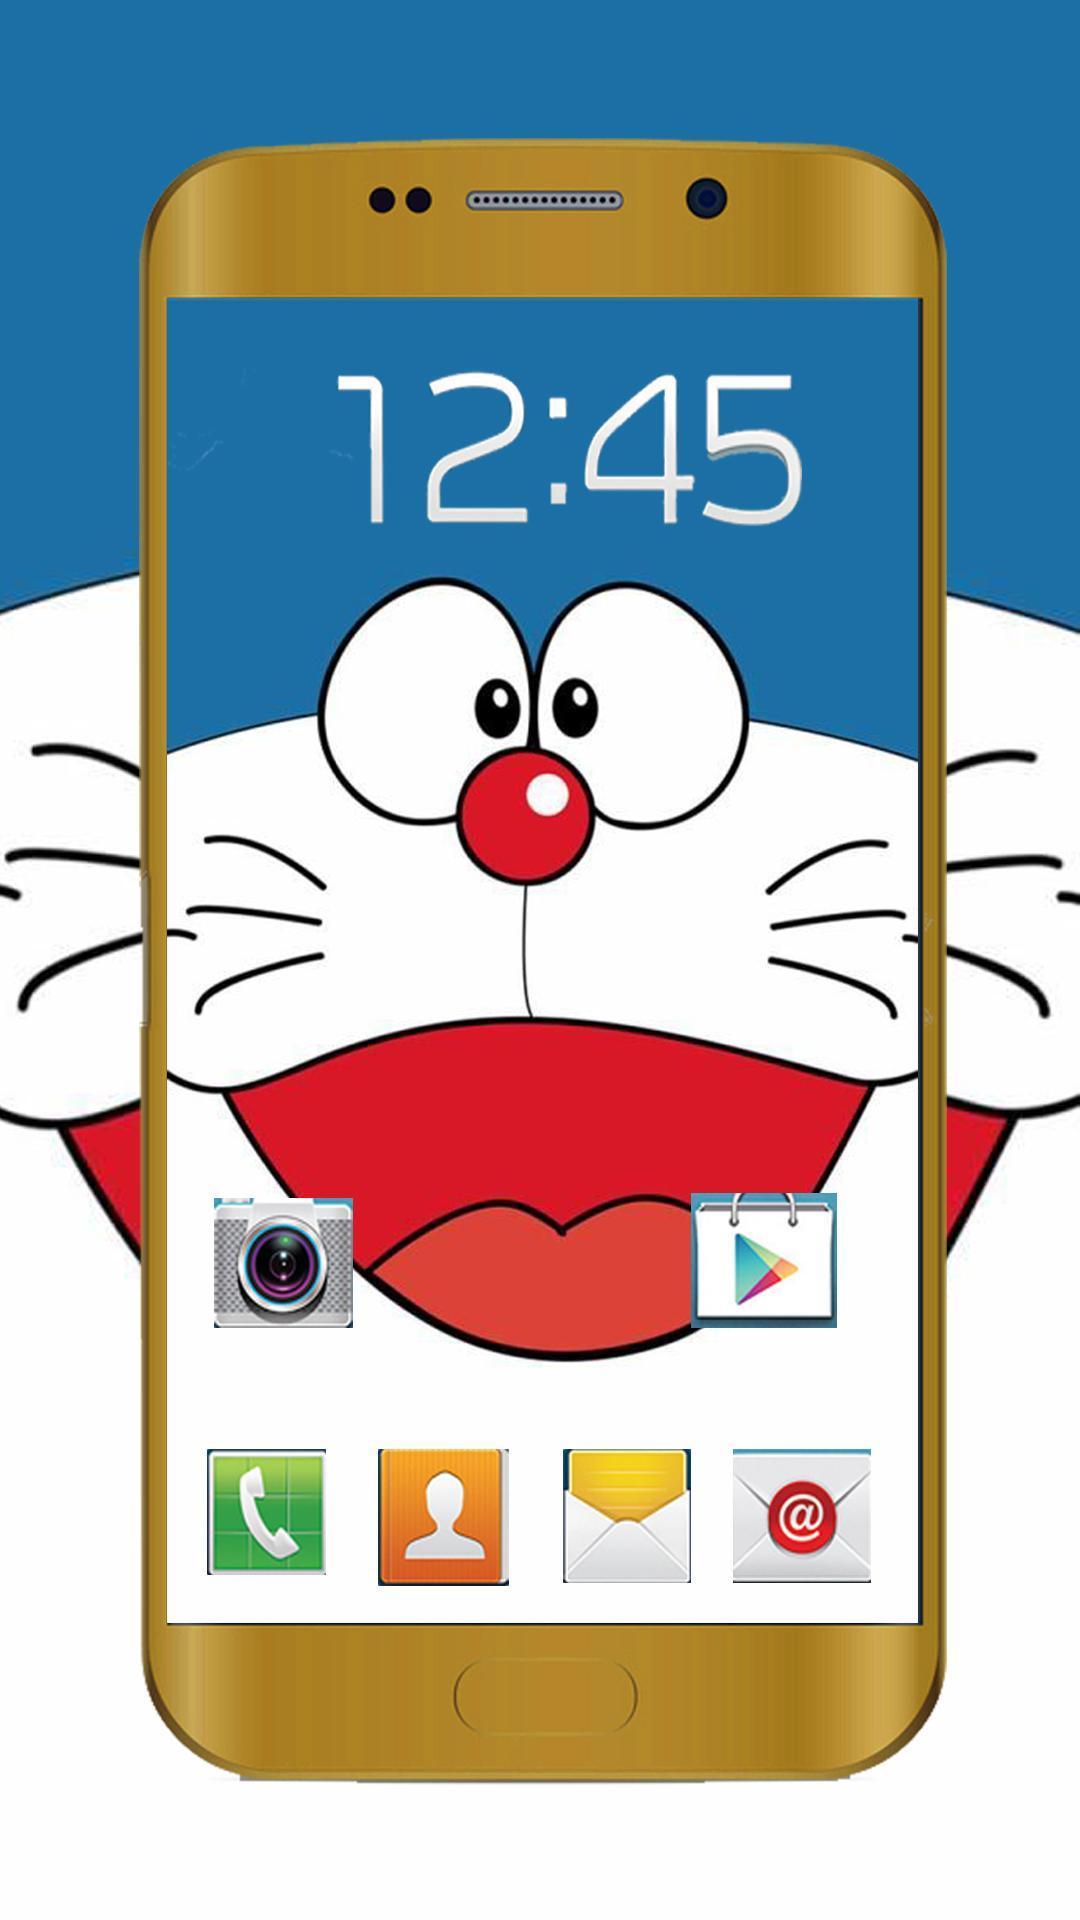 Unduh 4300 Wallpaper Doraemon Lucu Hd HD Terbaru